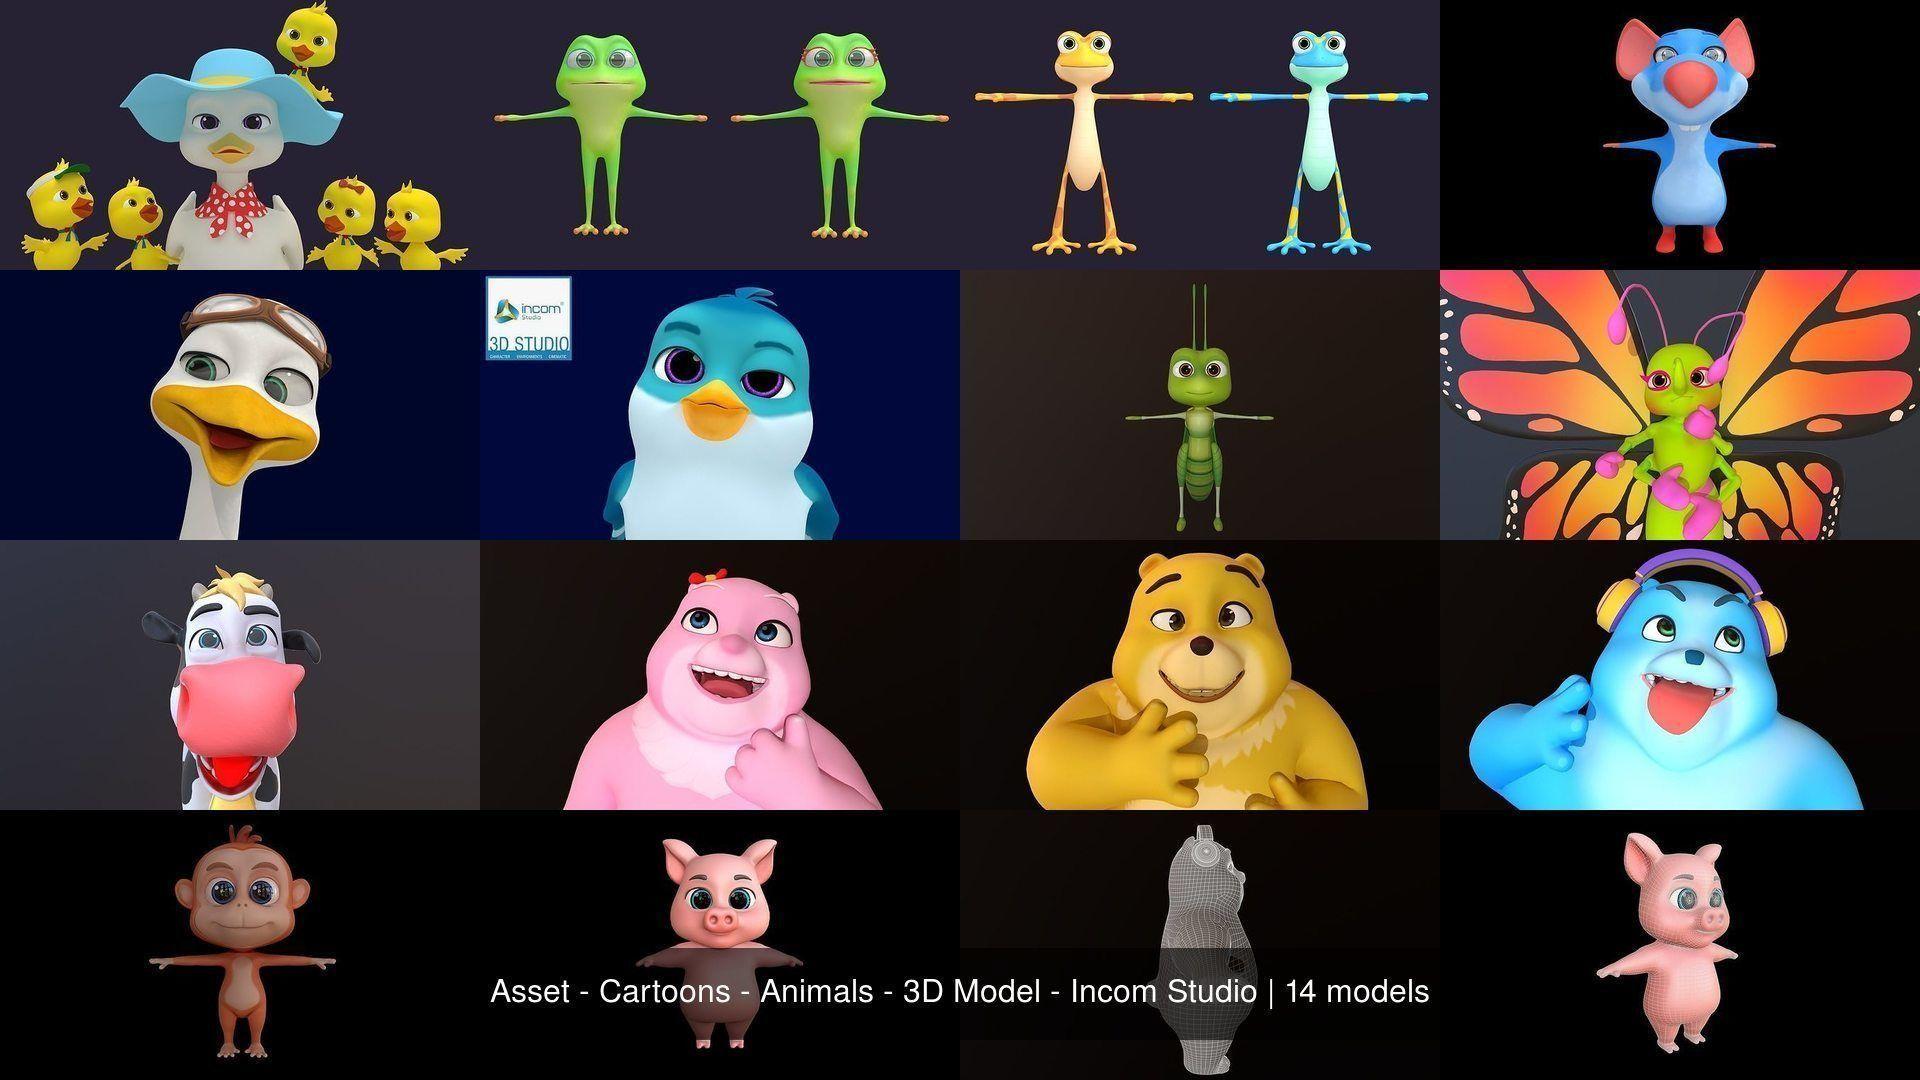 Asset - Cartoons - Animals - 3D Model - Incom Studio